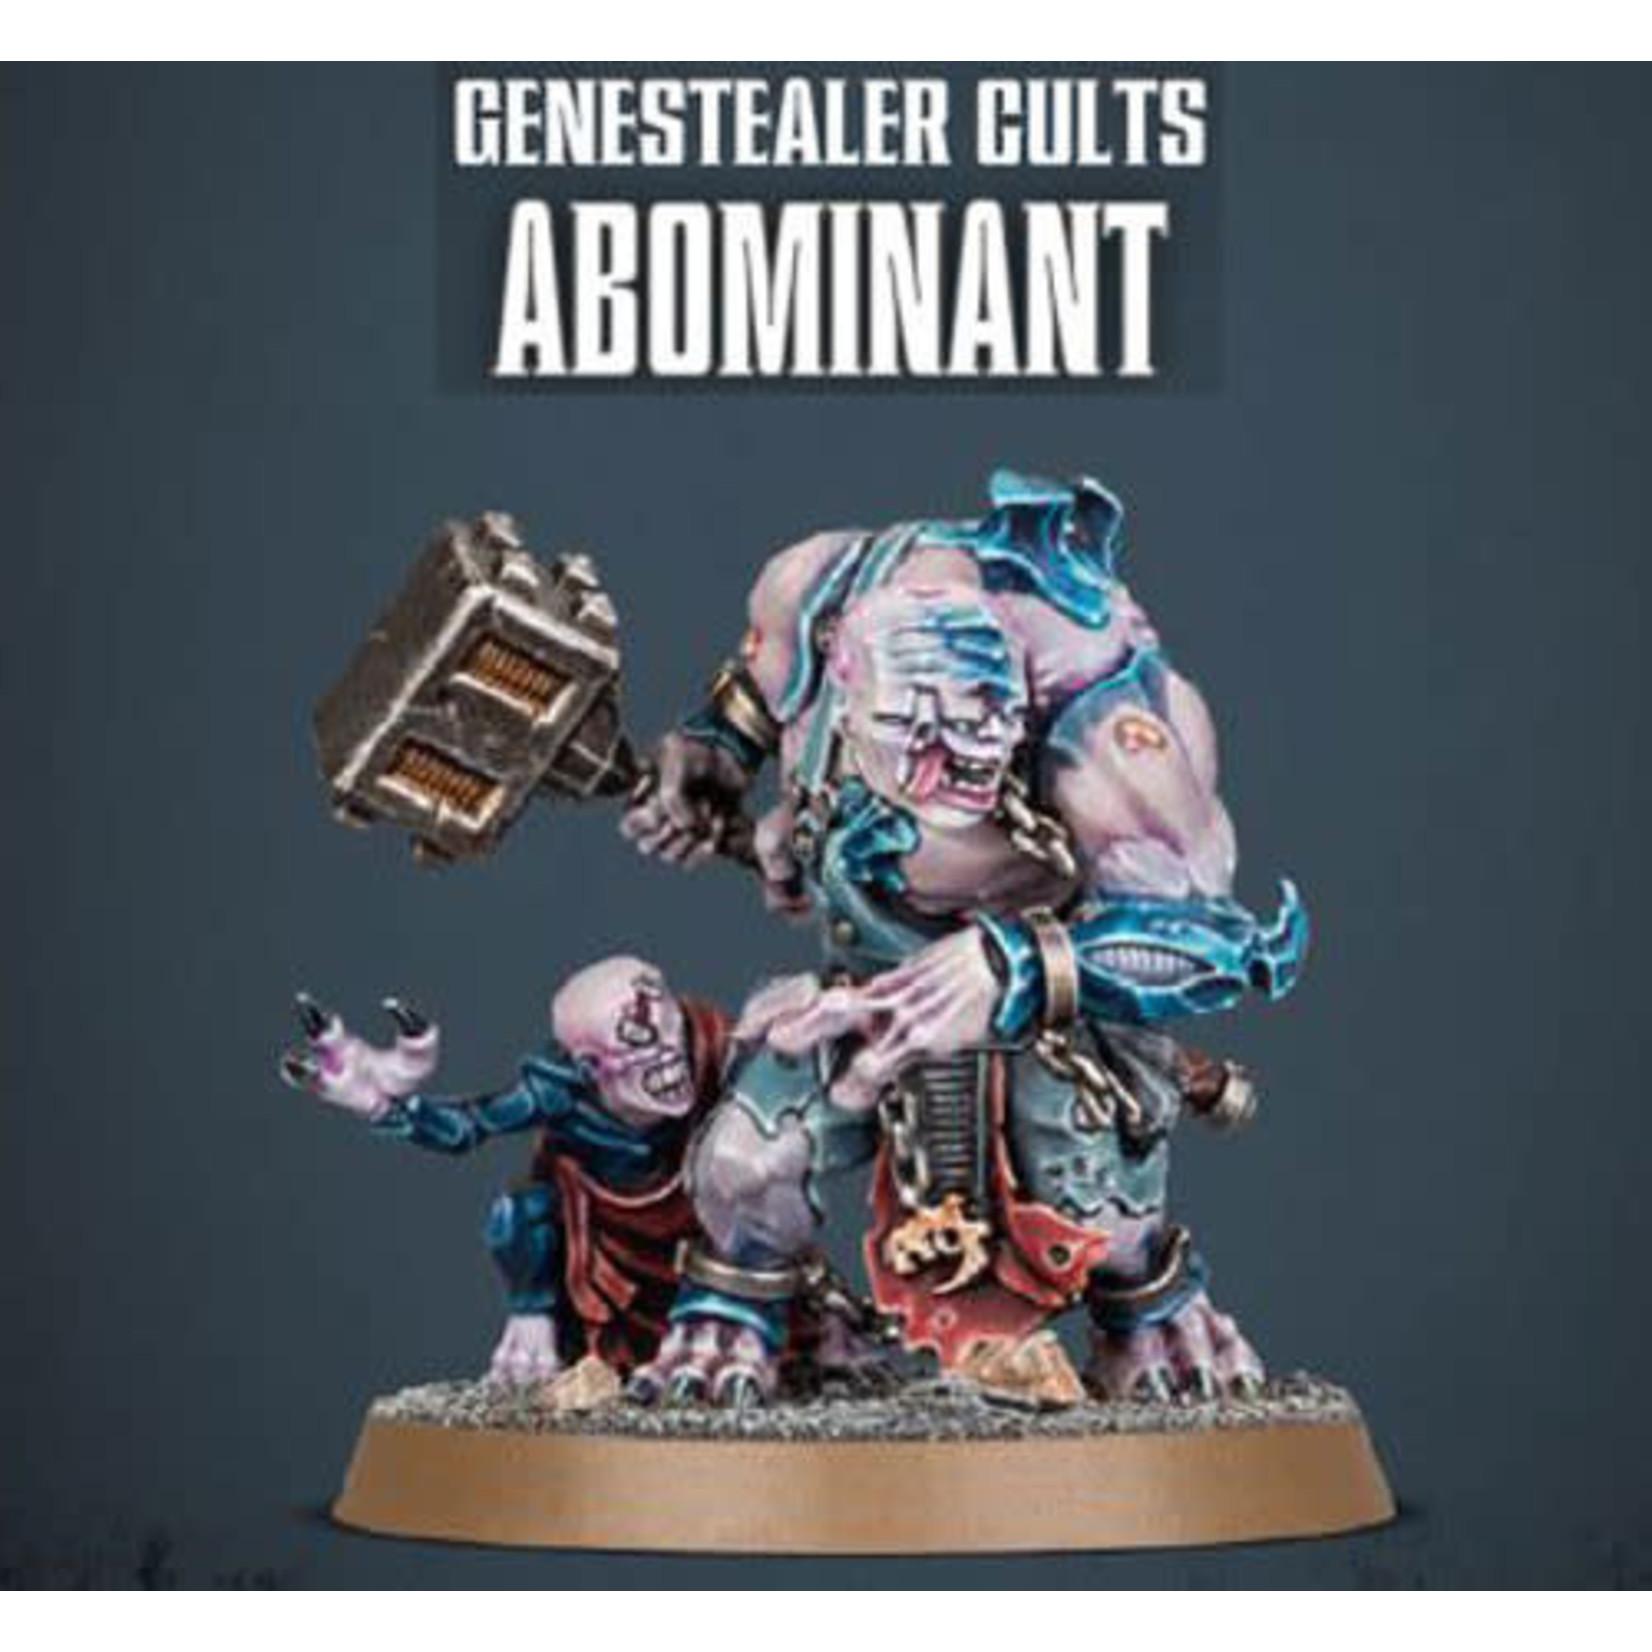 Genestealer Cults Abominant (40K)